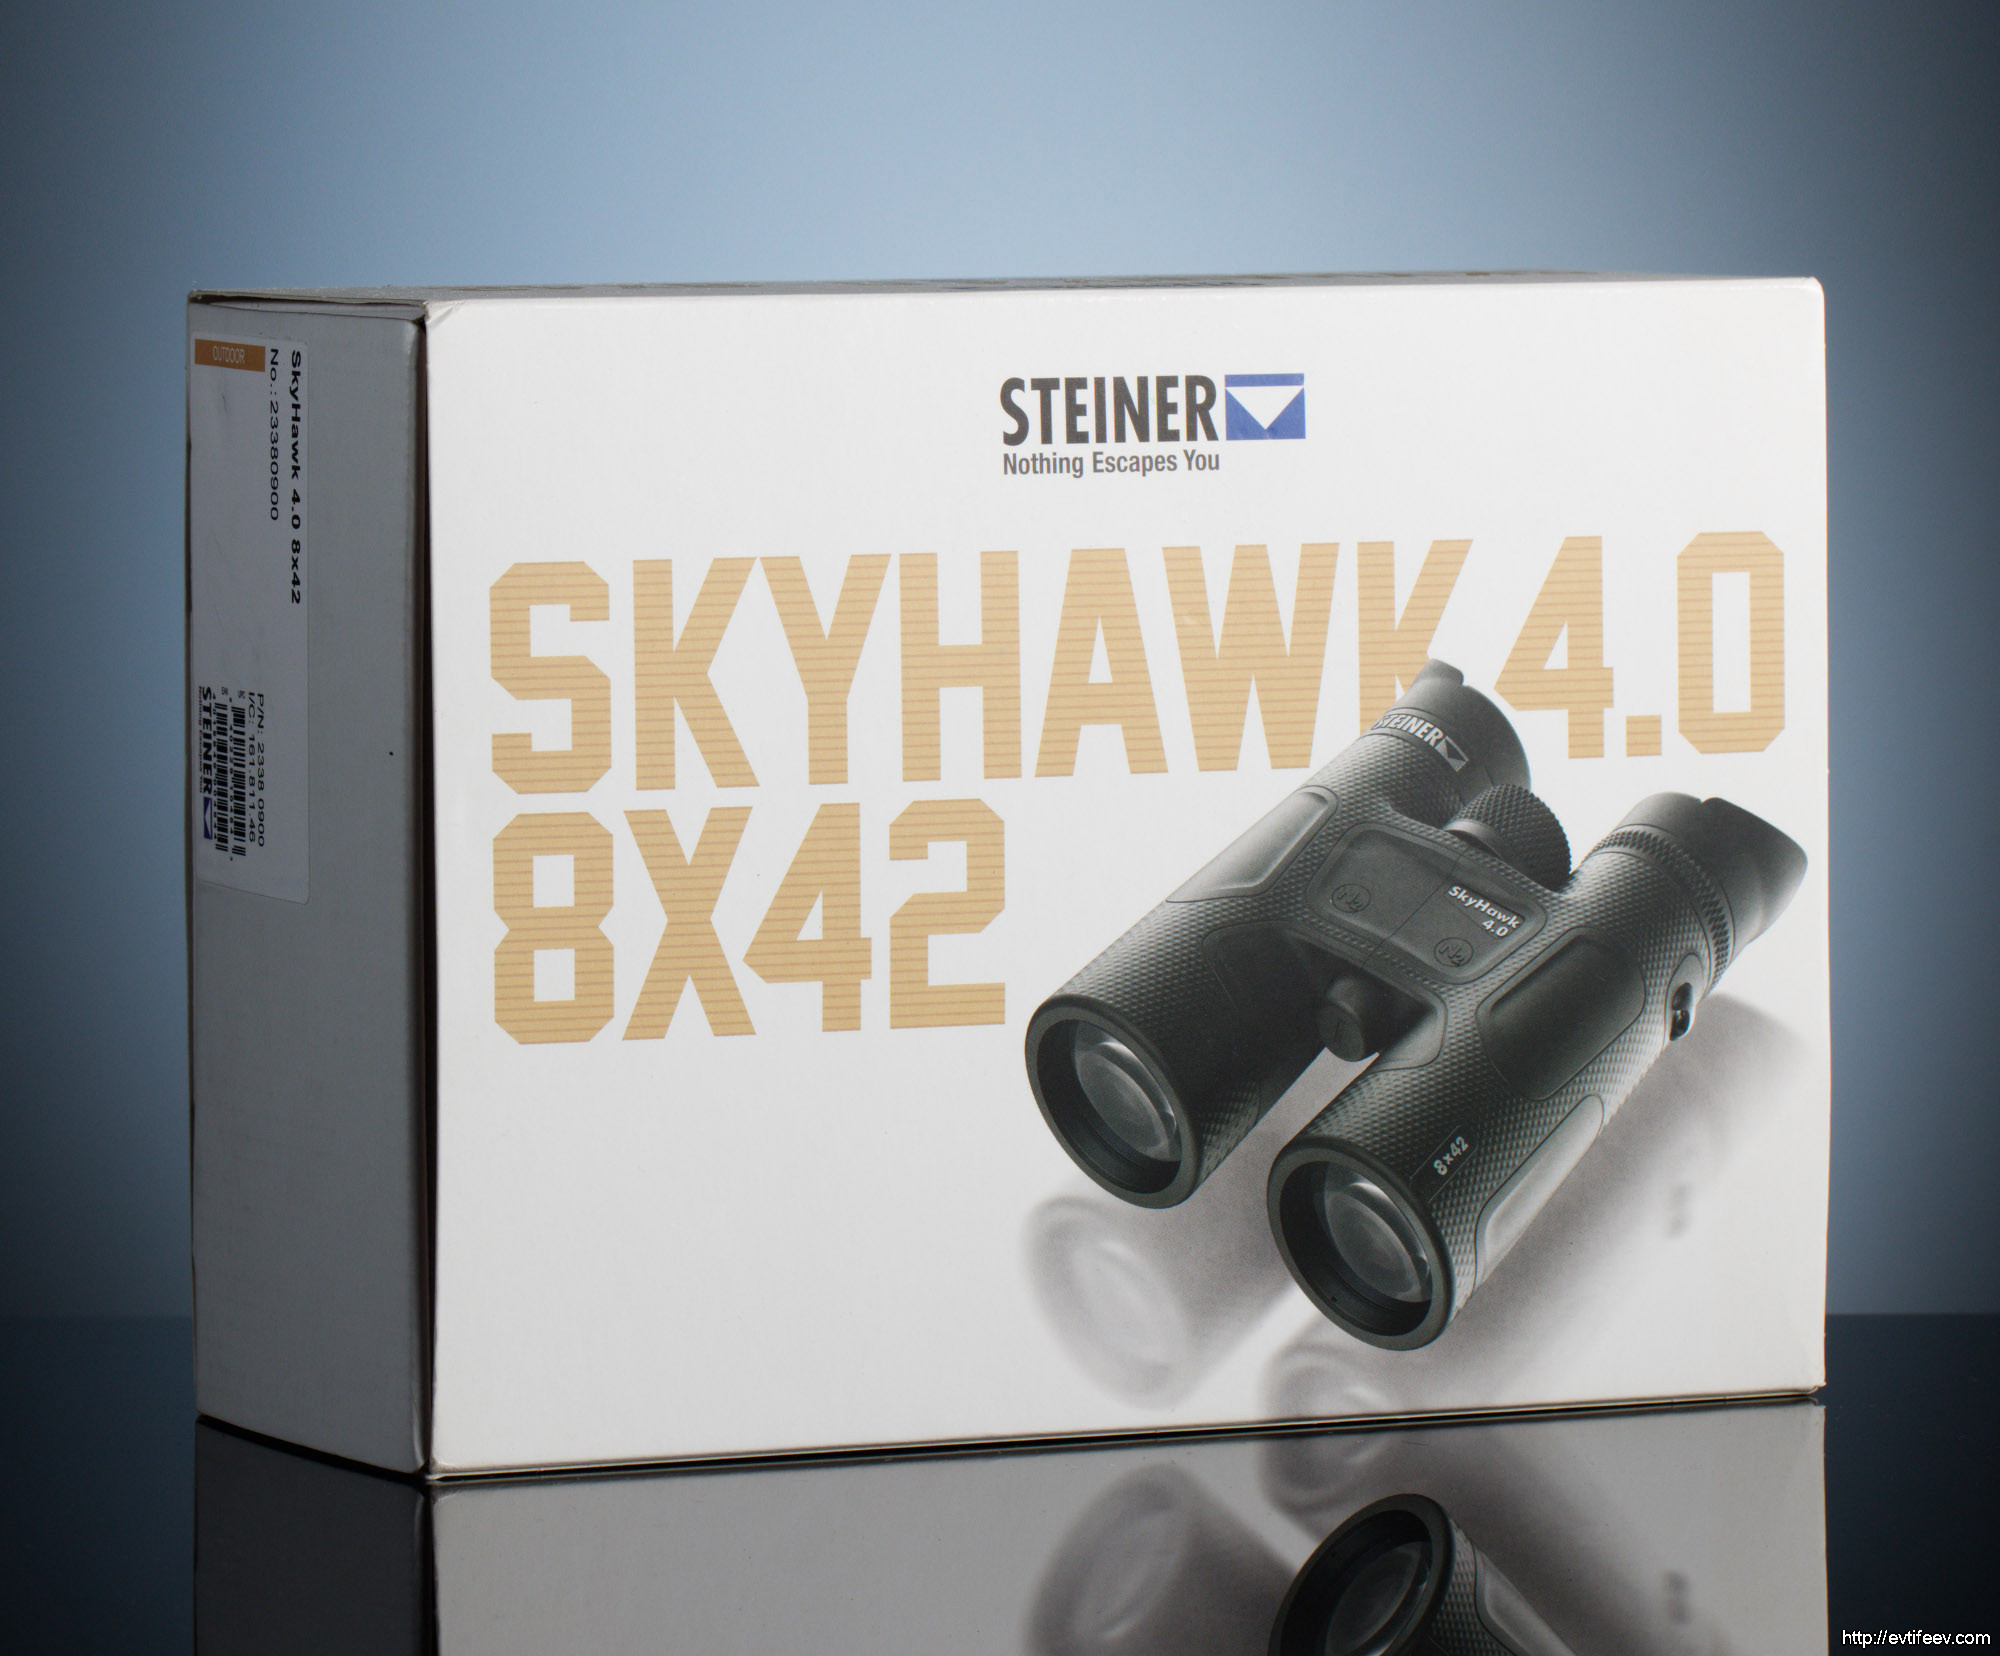 Обзор и тест бинокля STEINER SKYHAWK 4.0 8x42